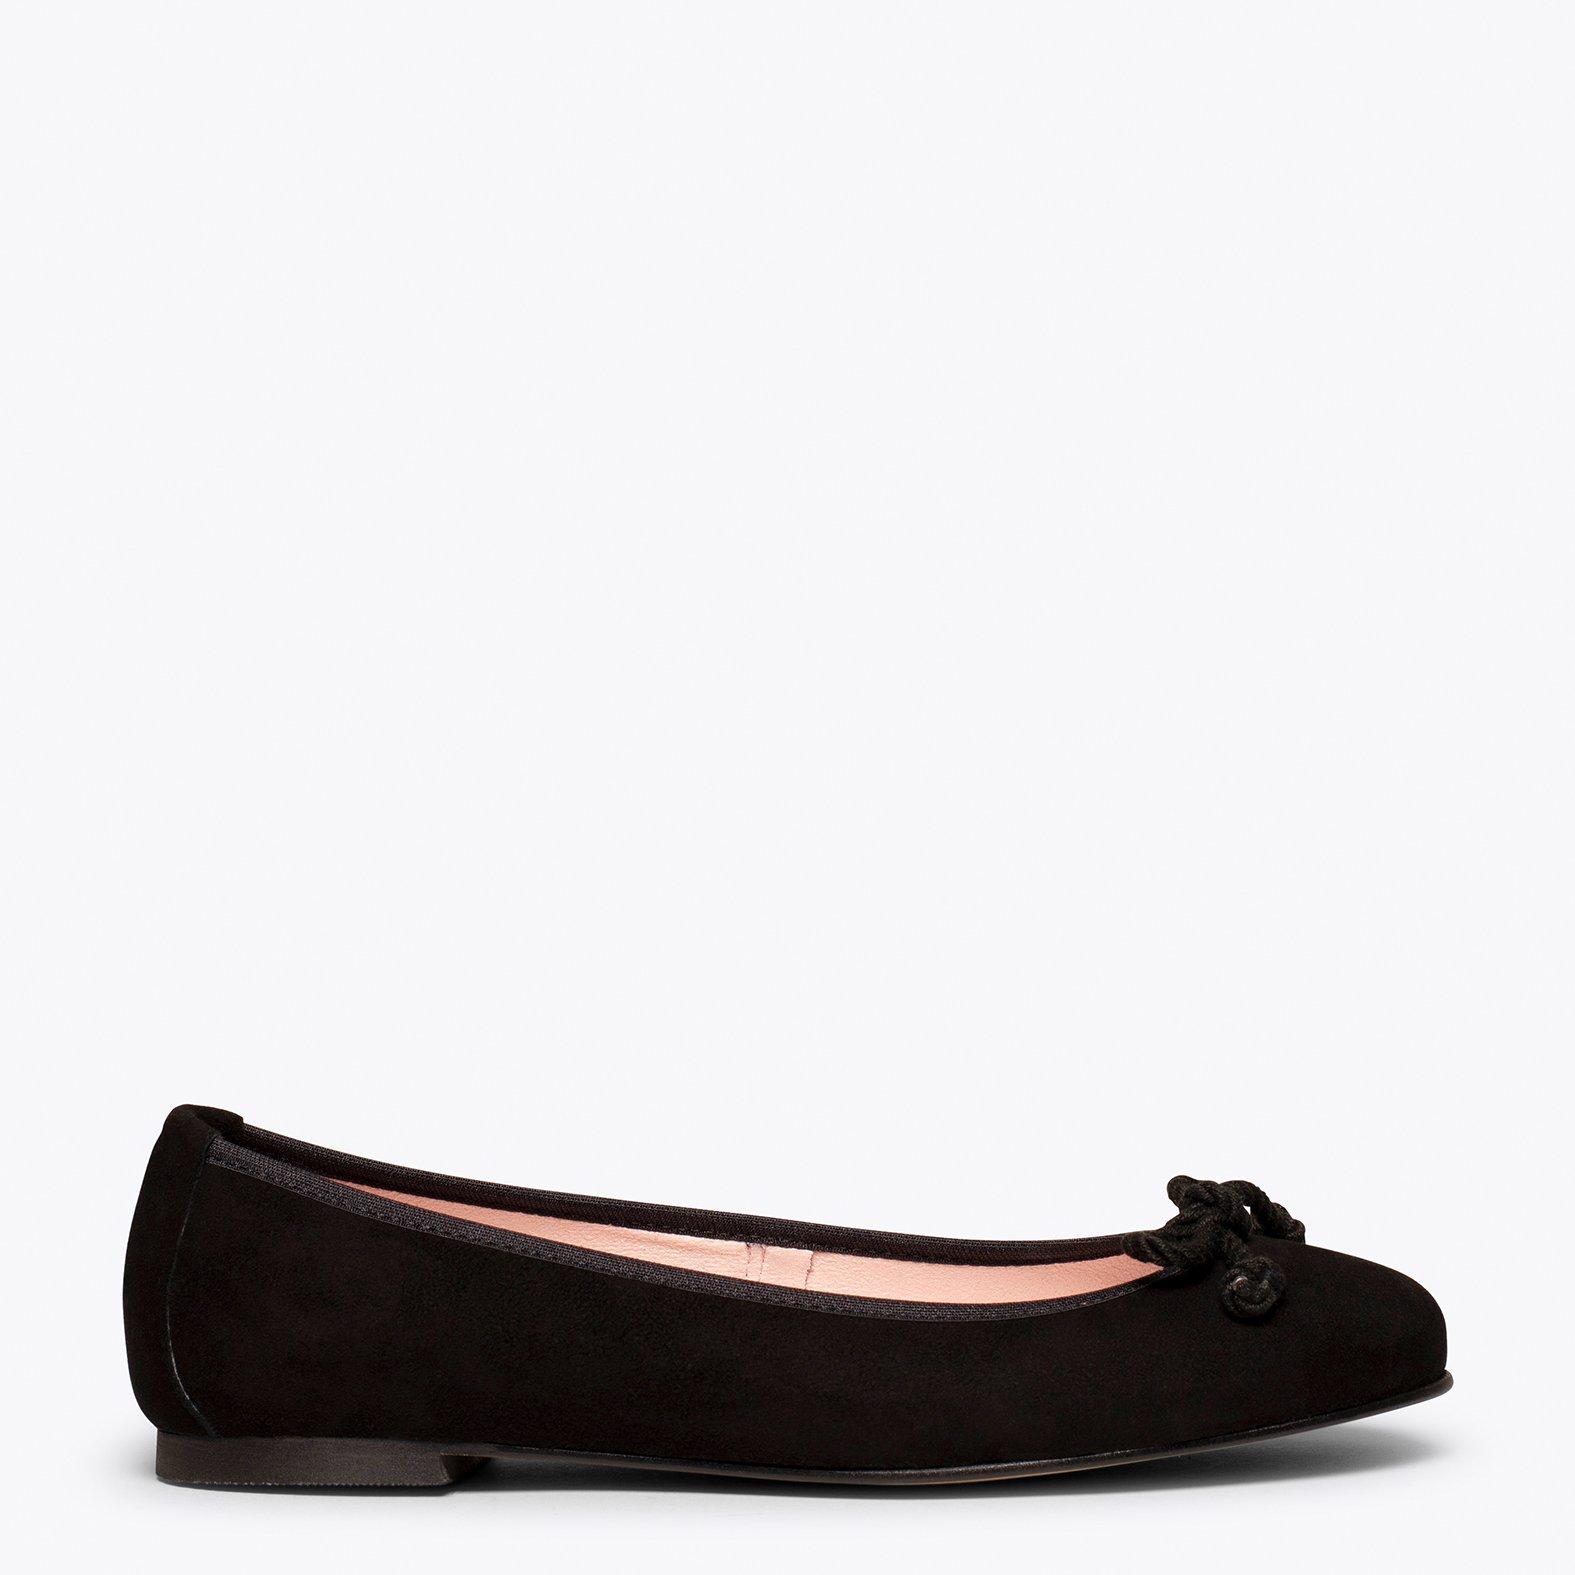 STILETTO Zapato con tacón fino NUDE